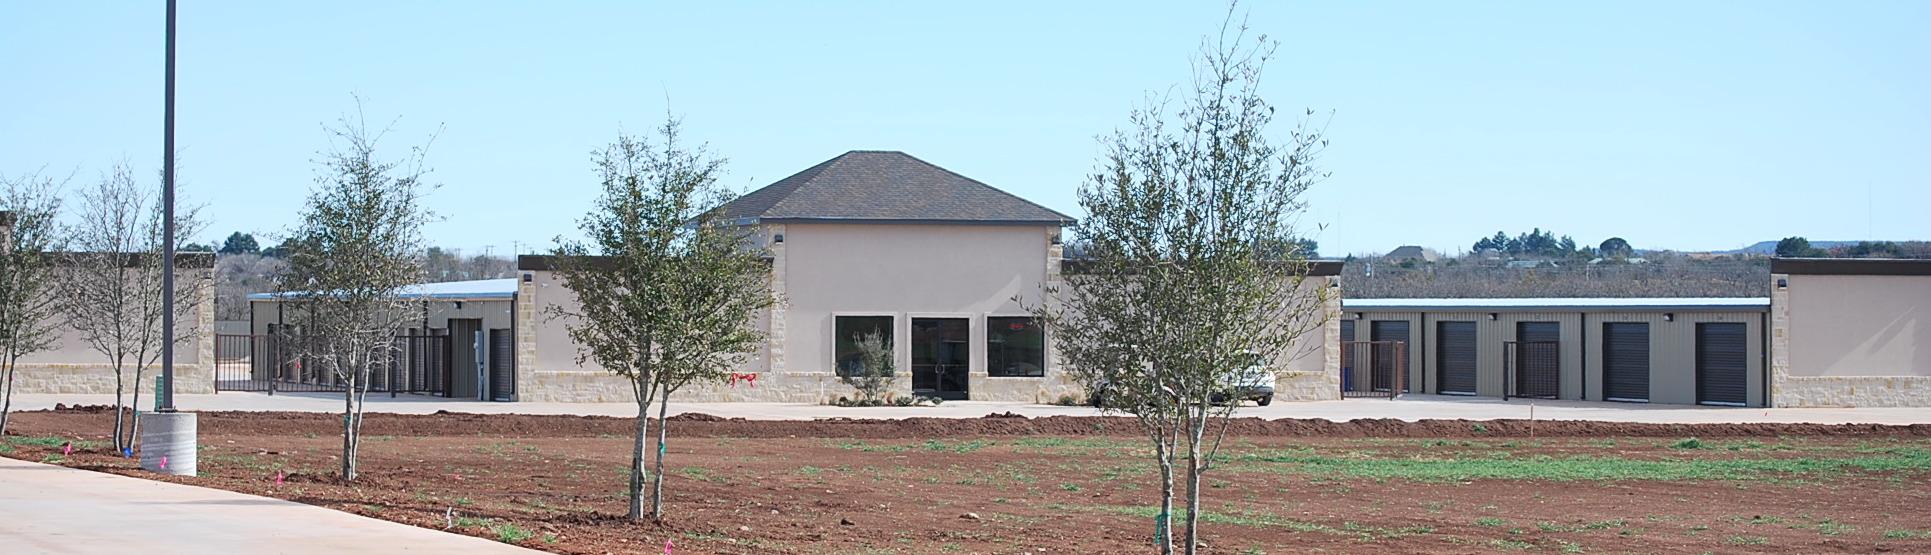 Storage Solutions in Abeline, TX